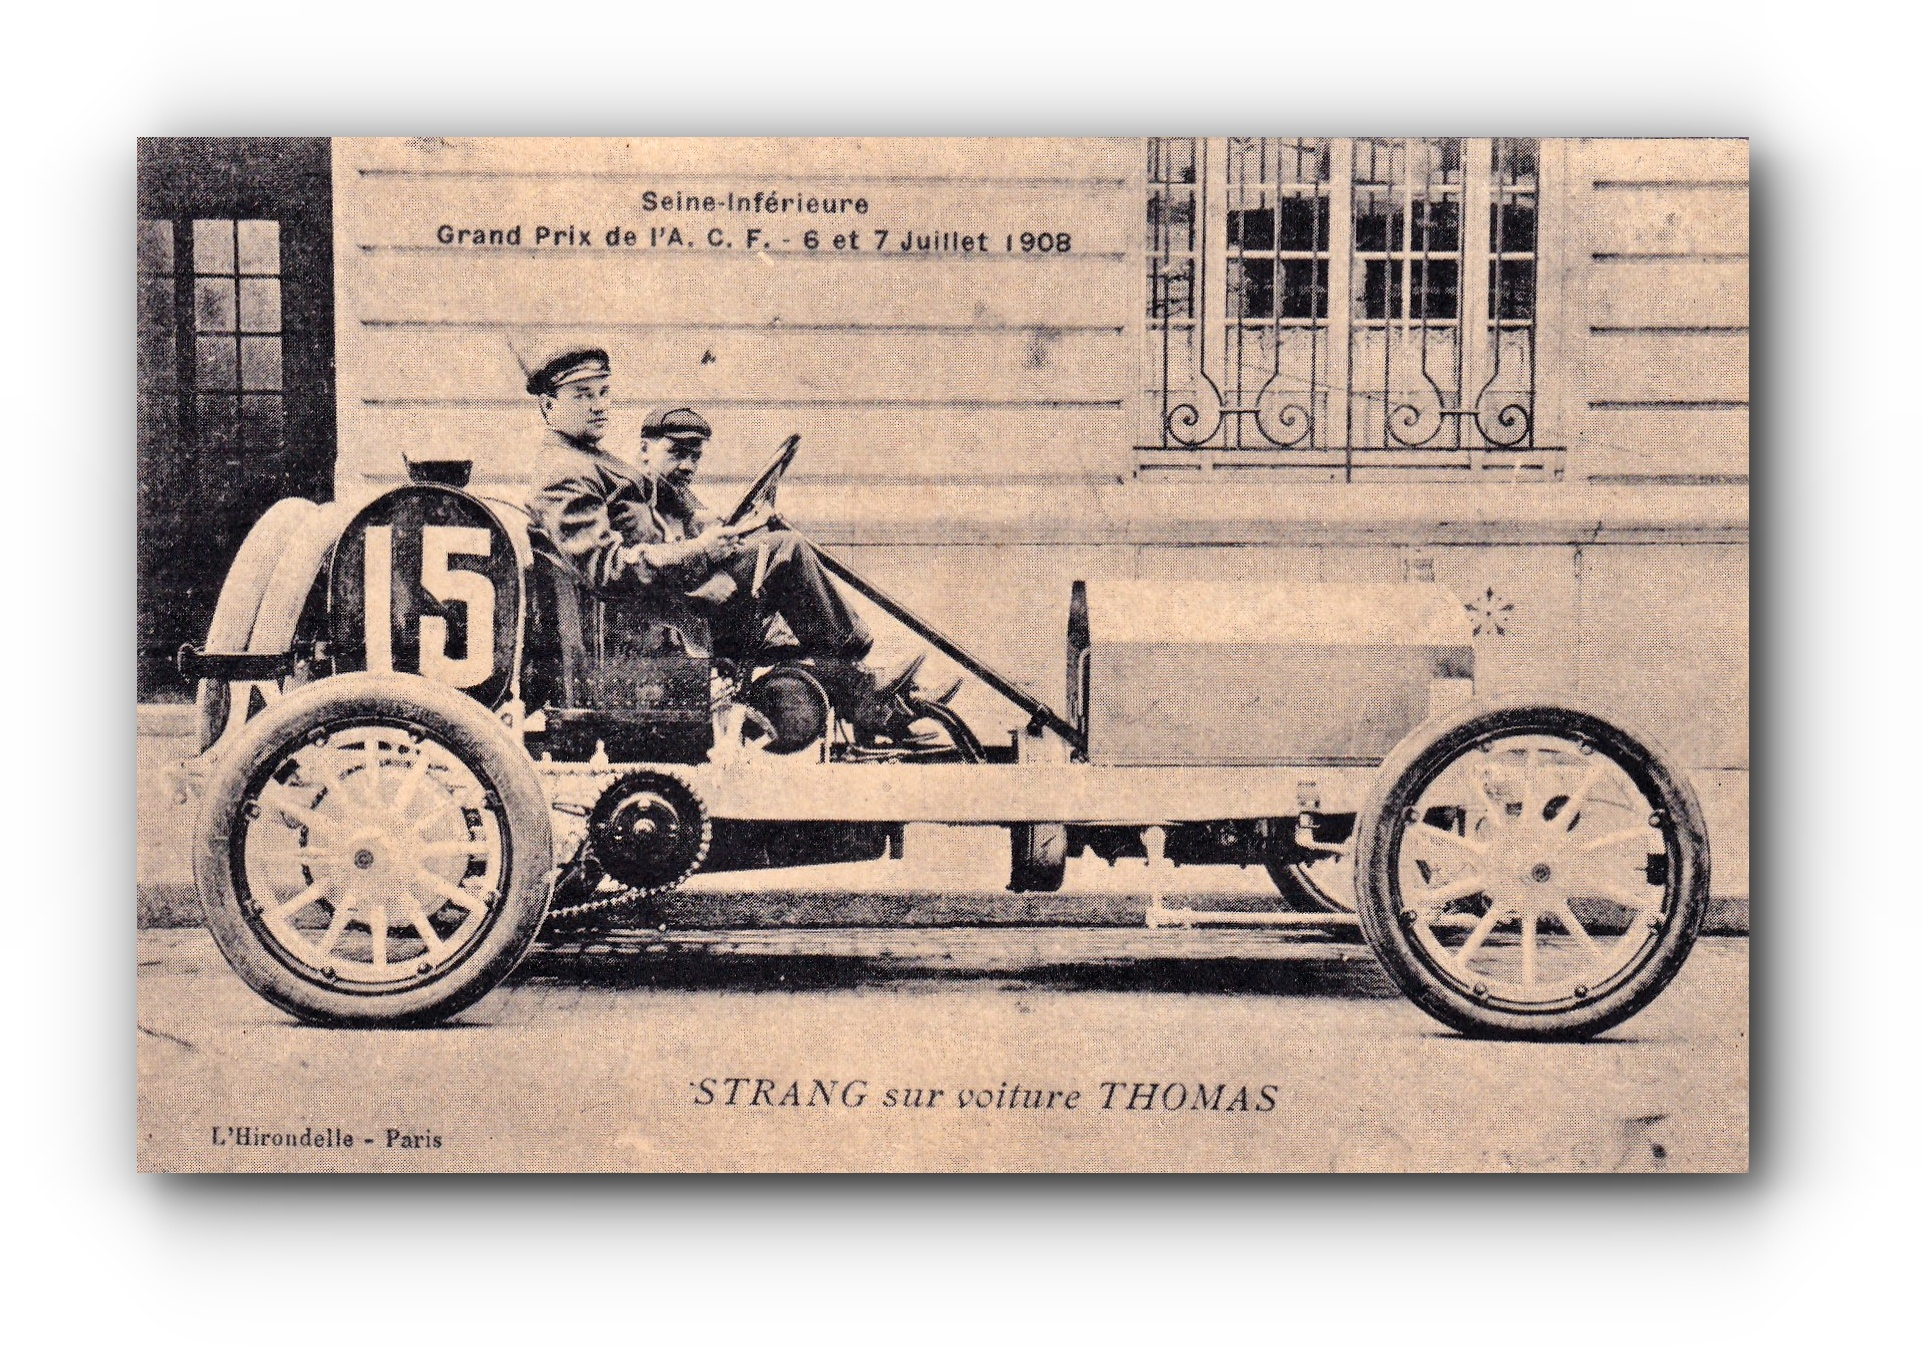 STRANG in einem Thomas Auto - 1908 - STRANG sur voiture Thomas - STRANG in a Thomas car